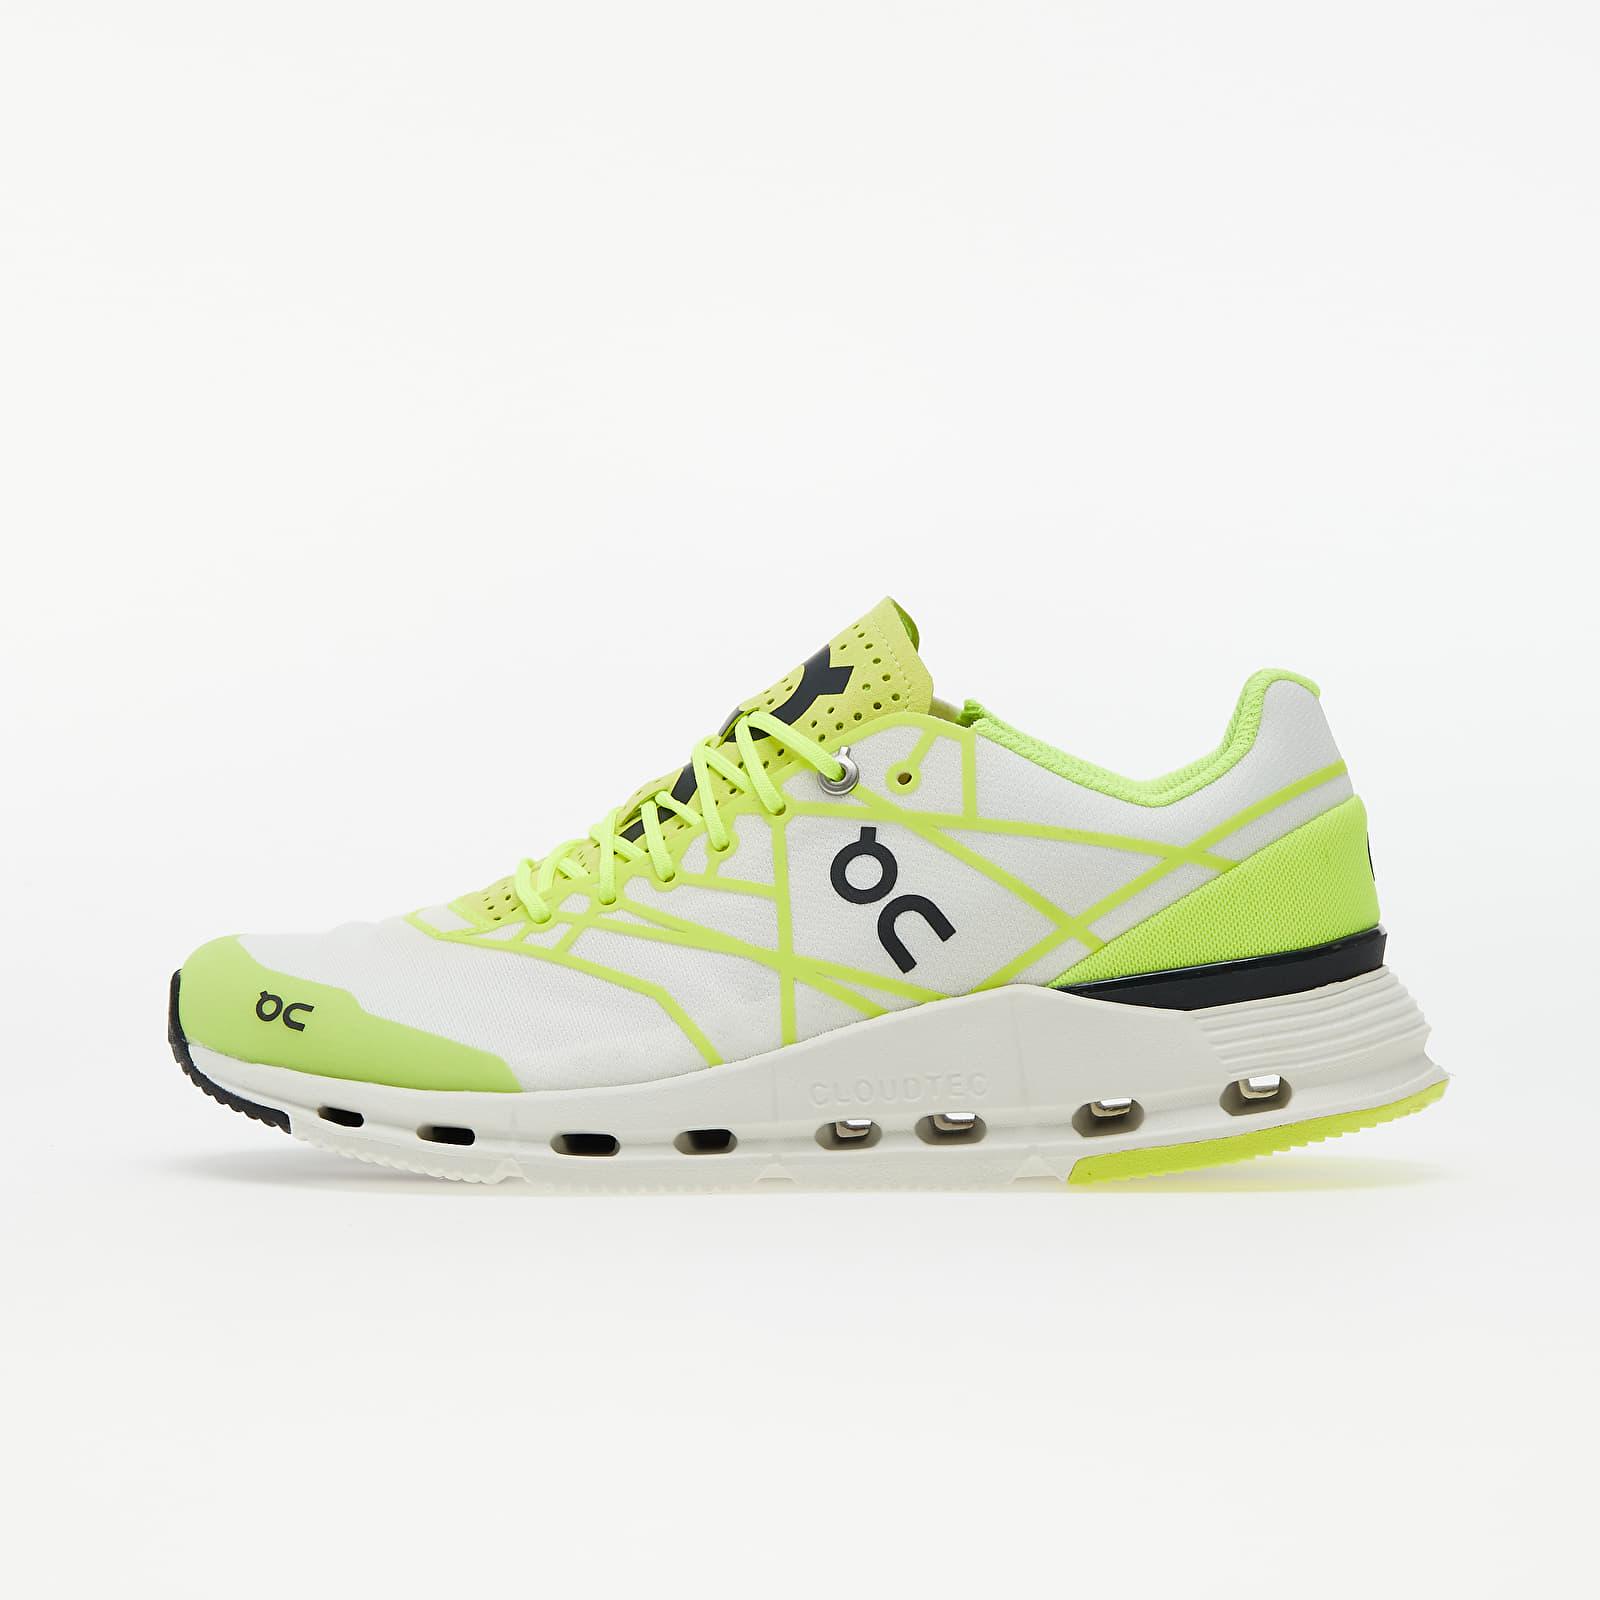 ON Running Cloudnova Z5 Neon/ White 10 26.99094